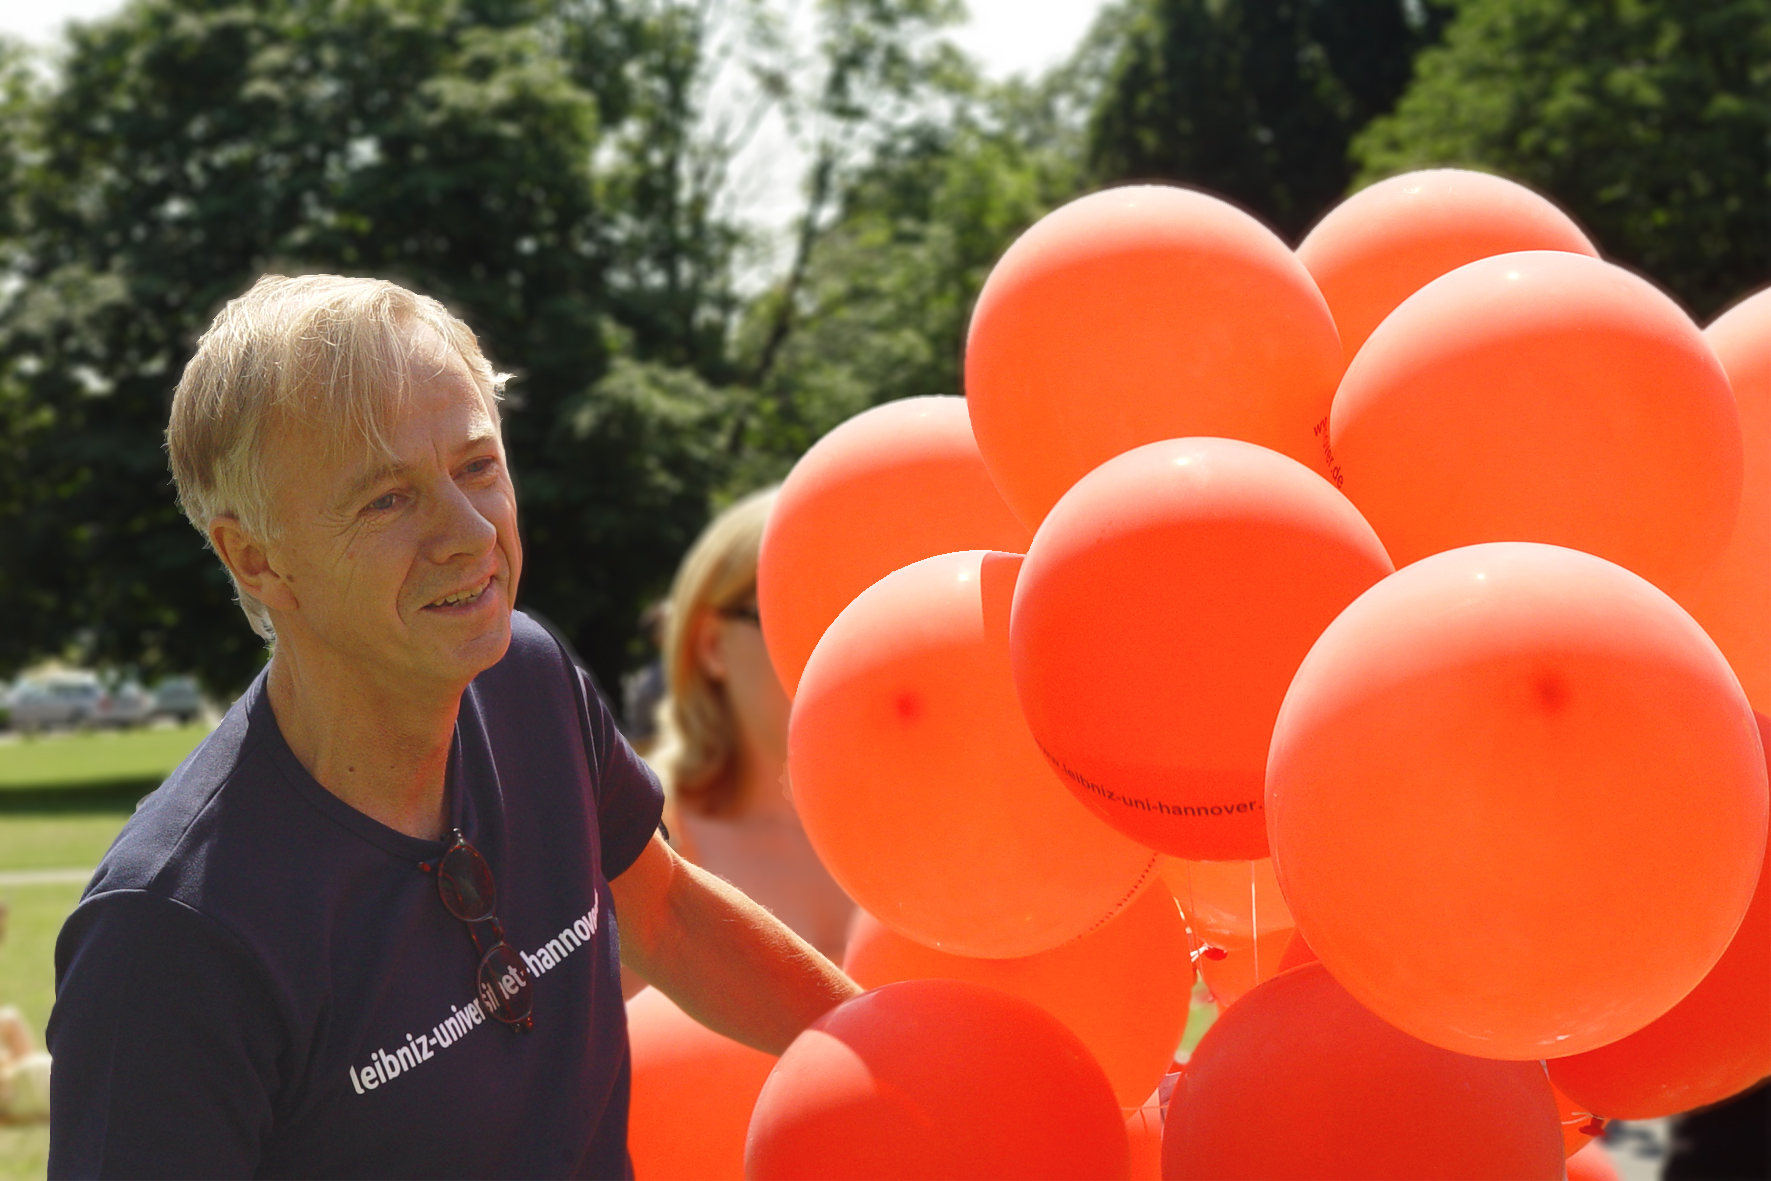 Fotos der ballon aktion zum download